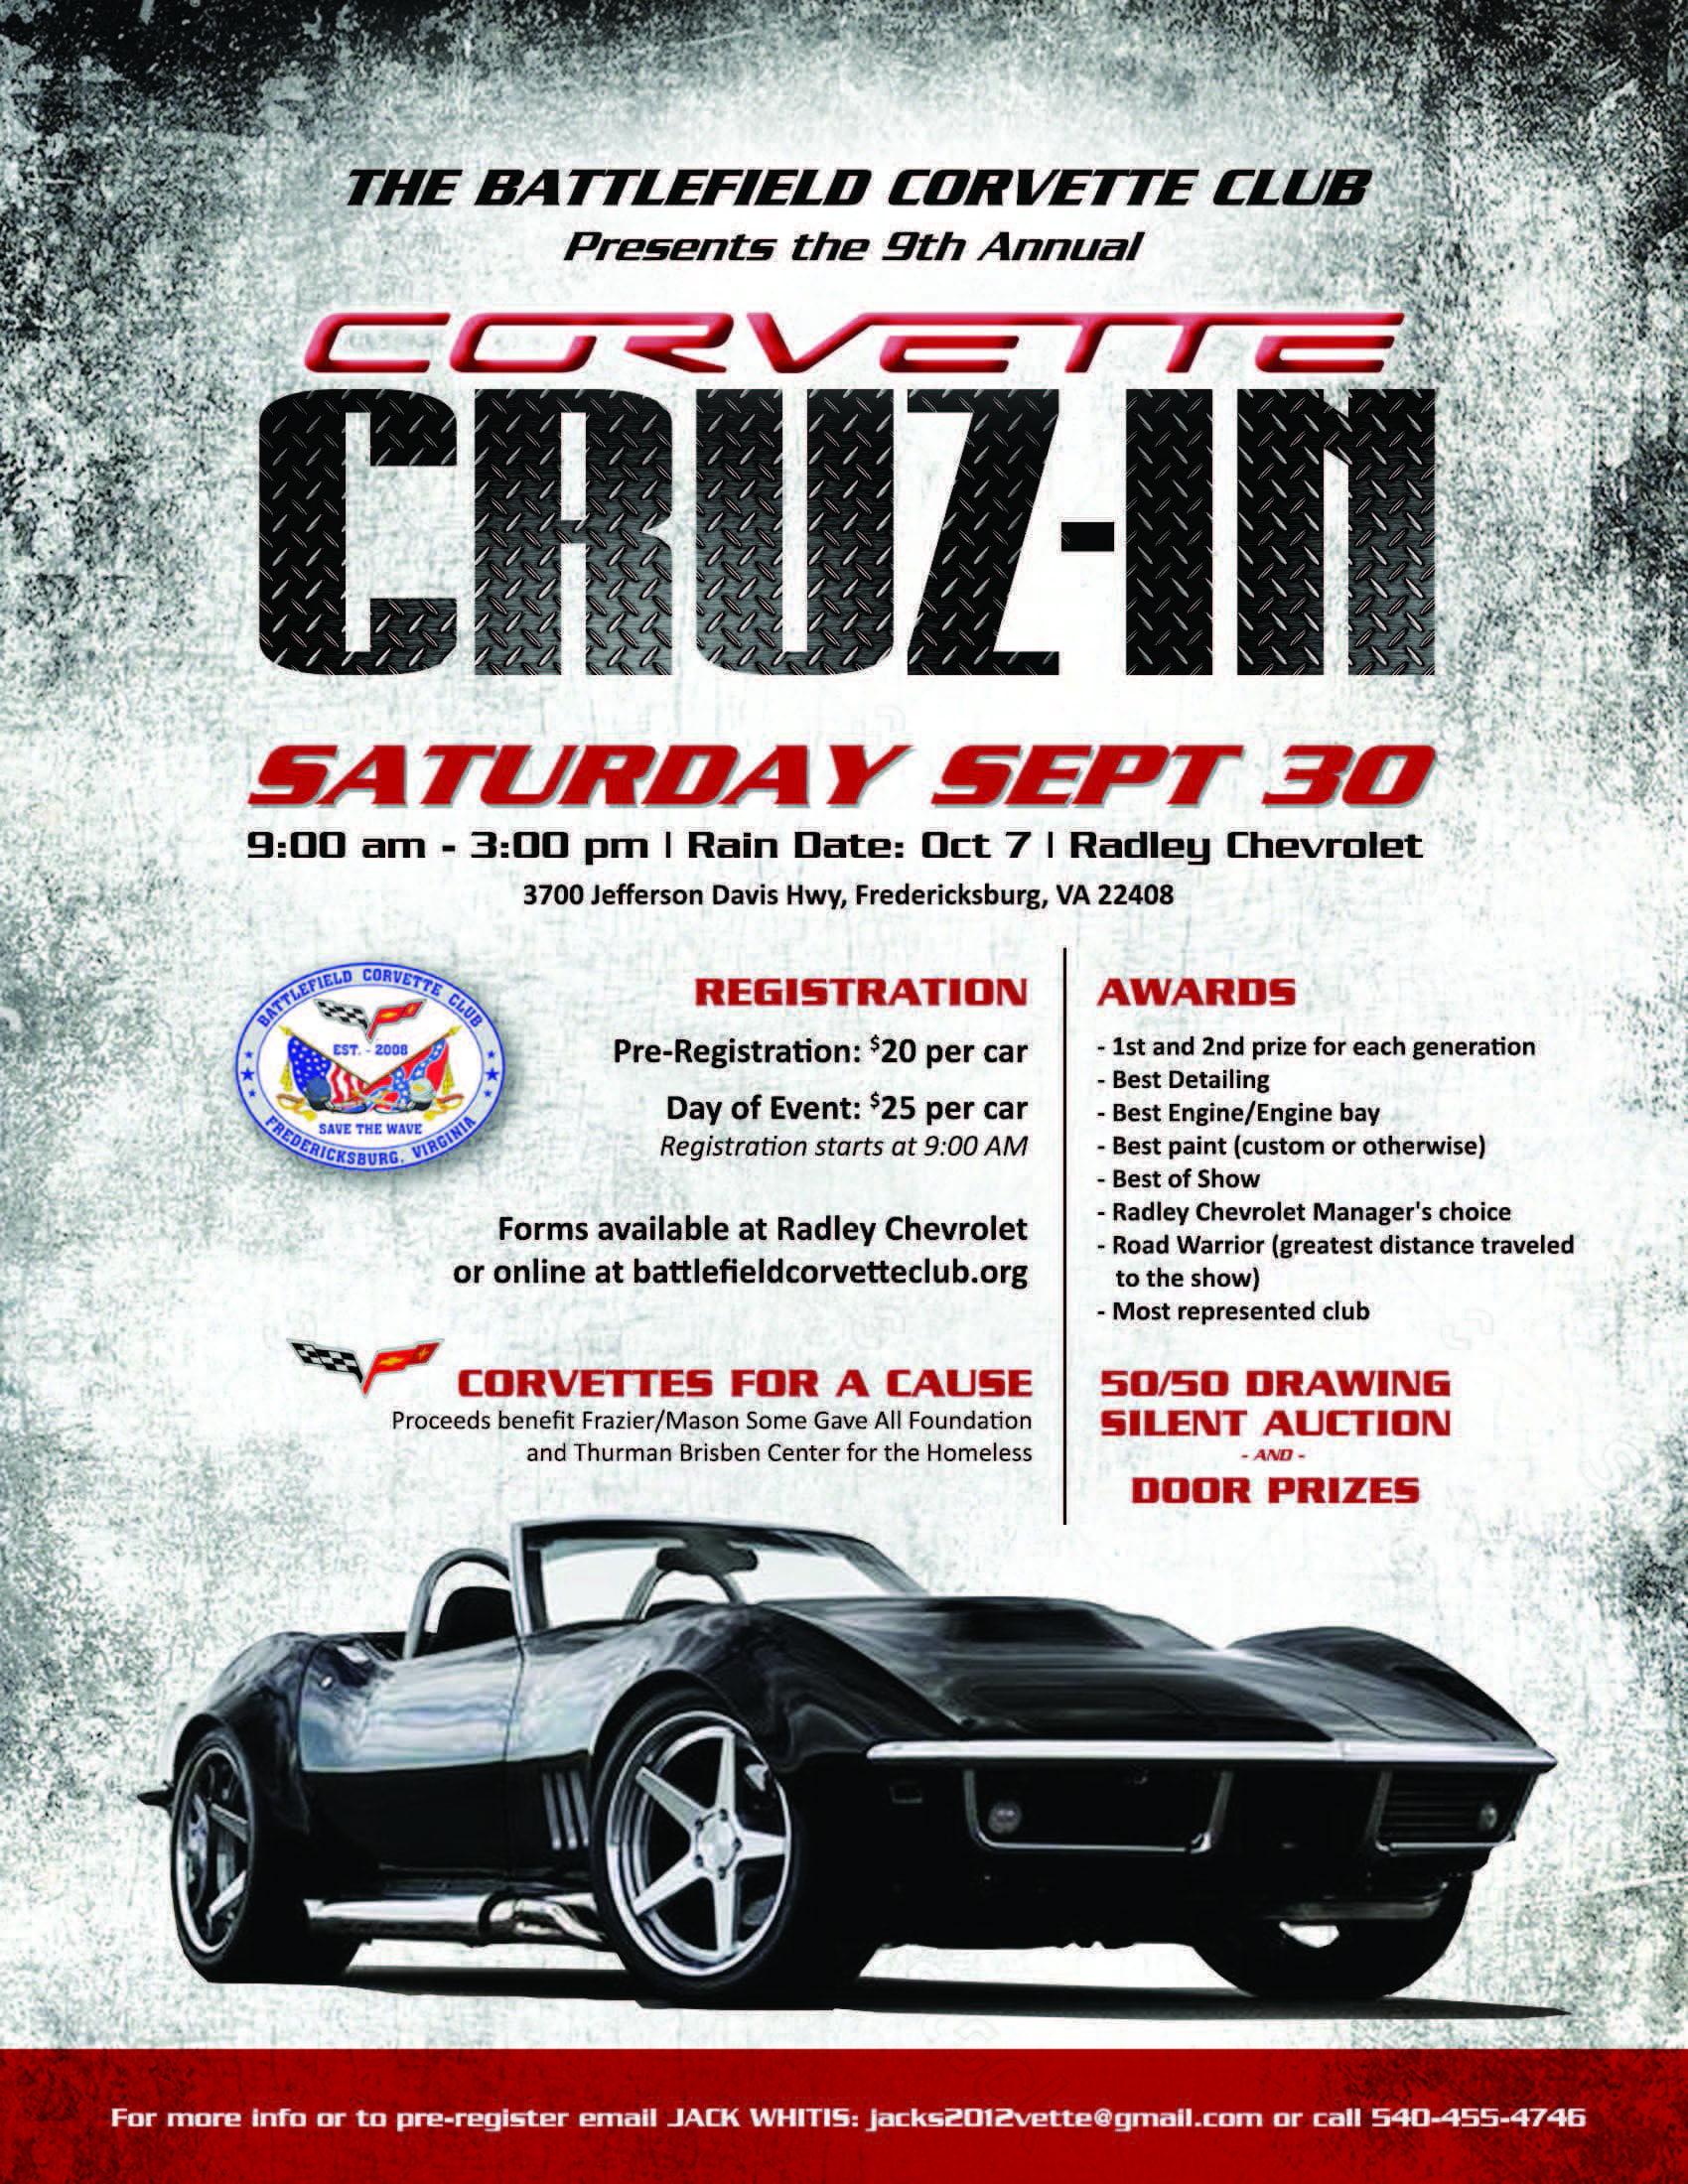 Battlefield Corvette Club, 9th Annual U201cAll Corvetteu201d Charity Car Show